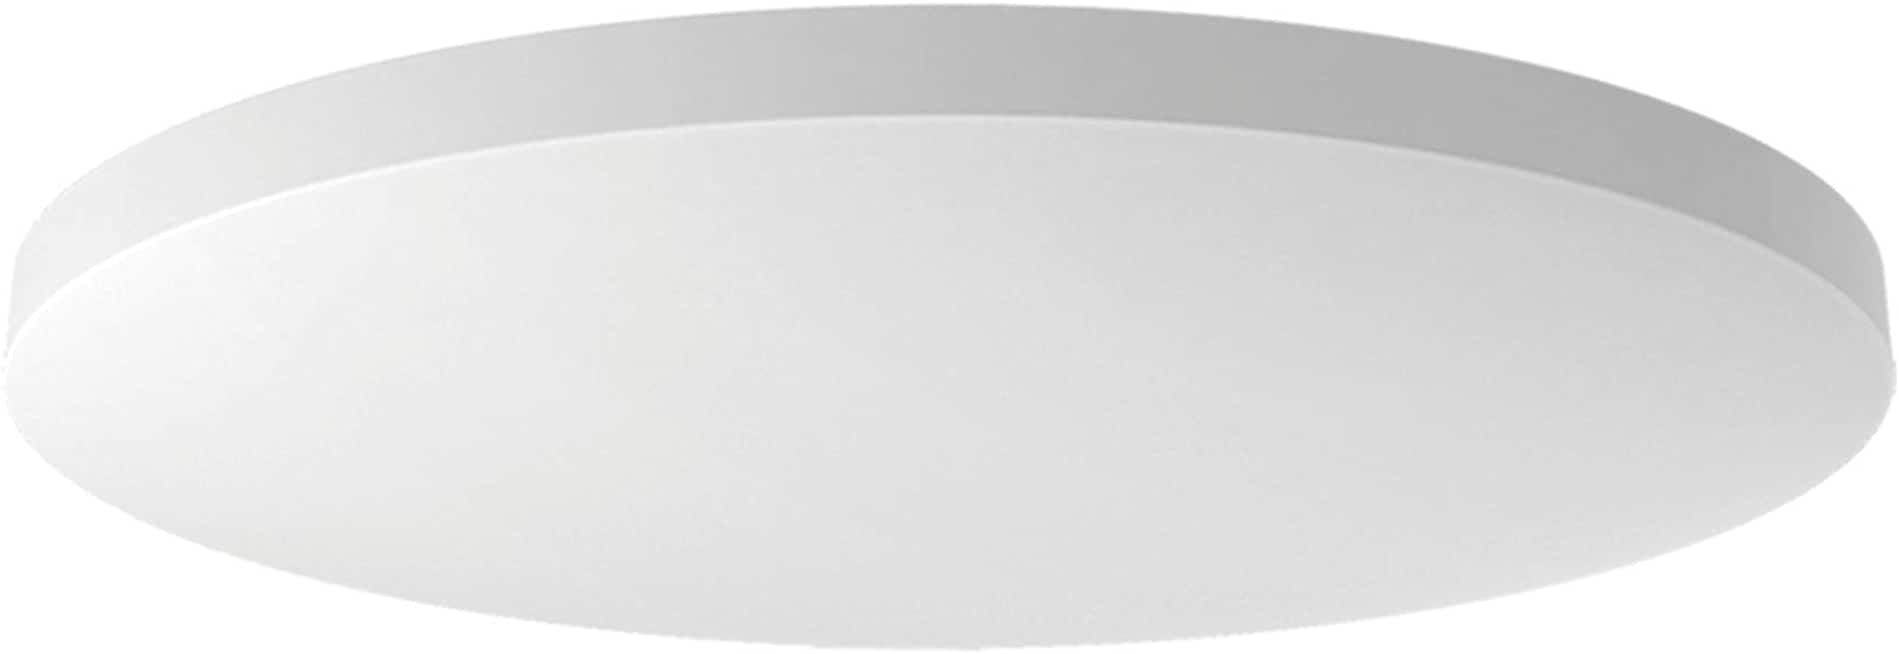 Люстра-тарелка Xiaomi Mi MiJia LED Ceiling Light MUE4086GL